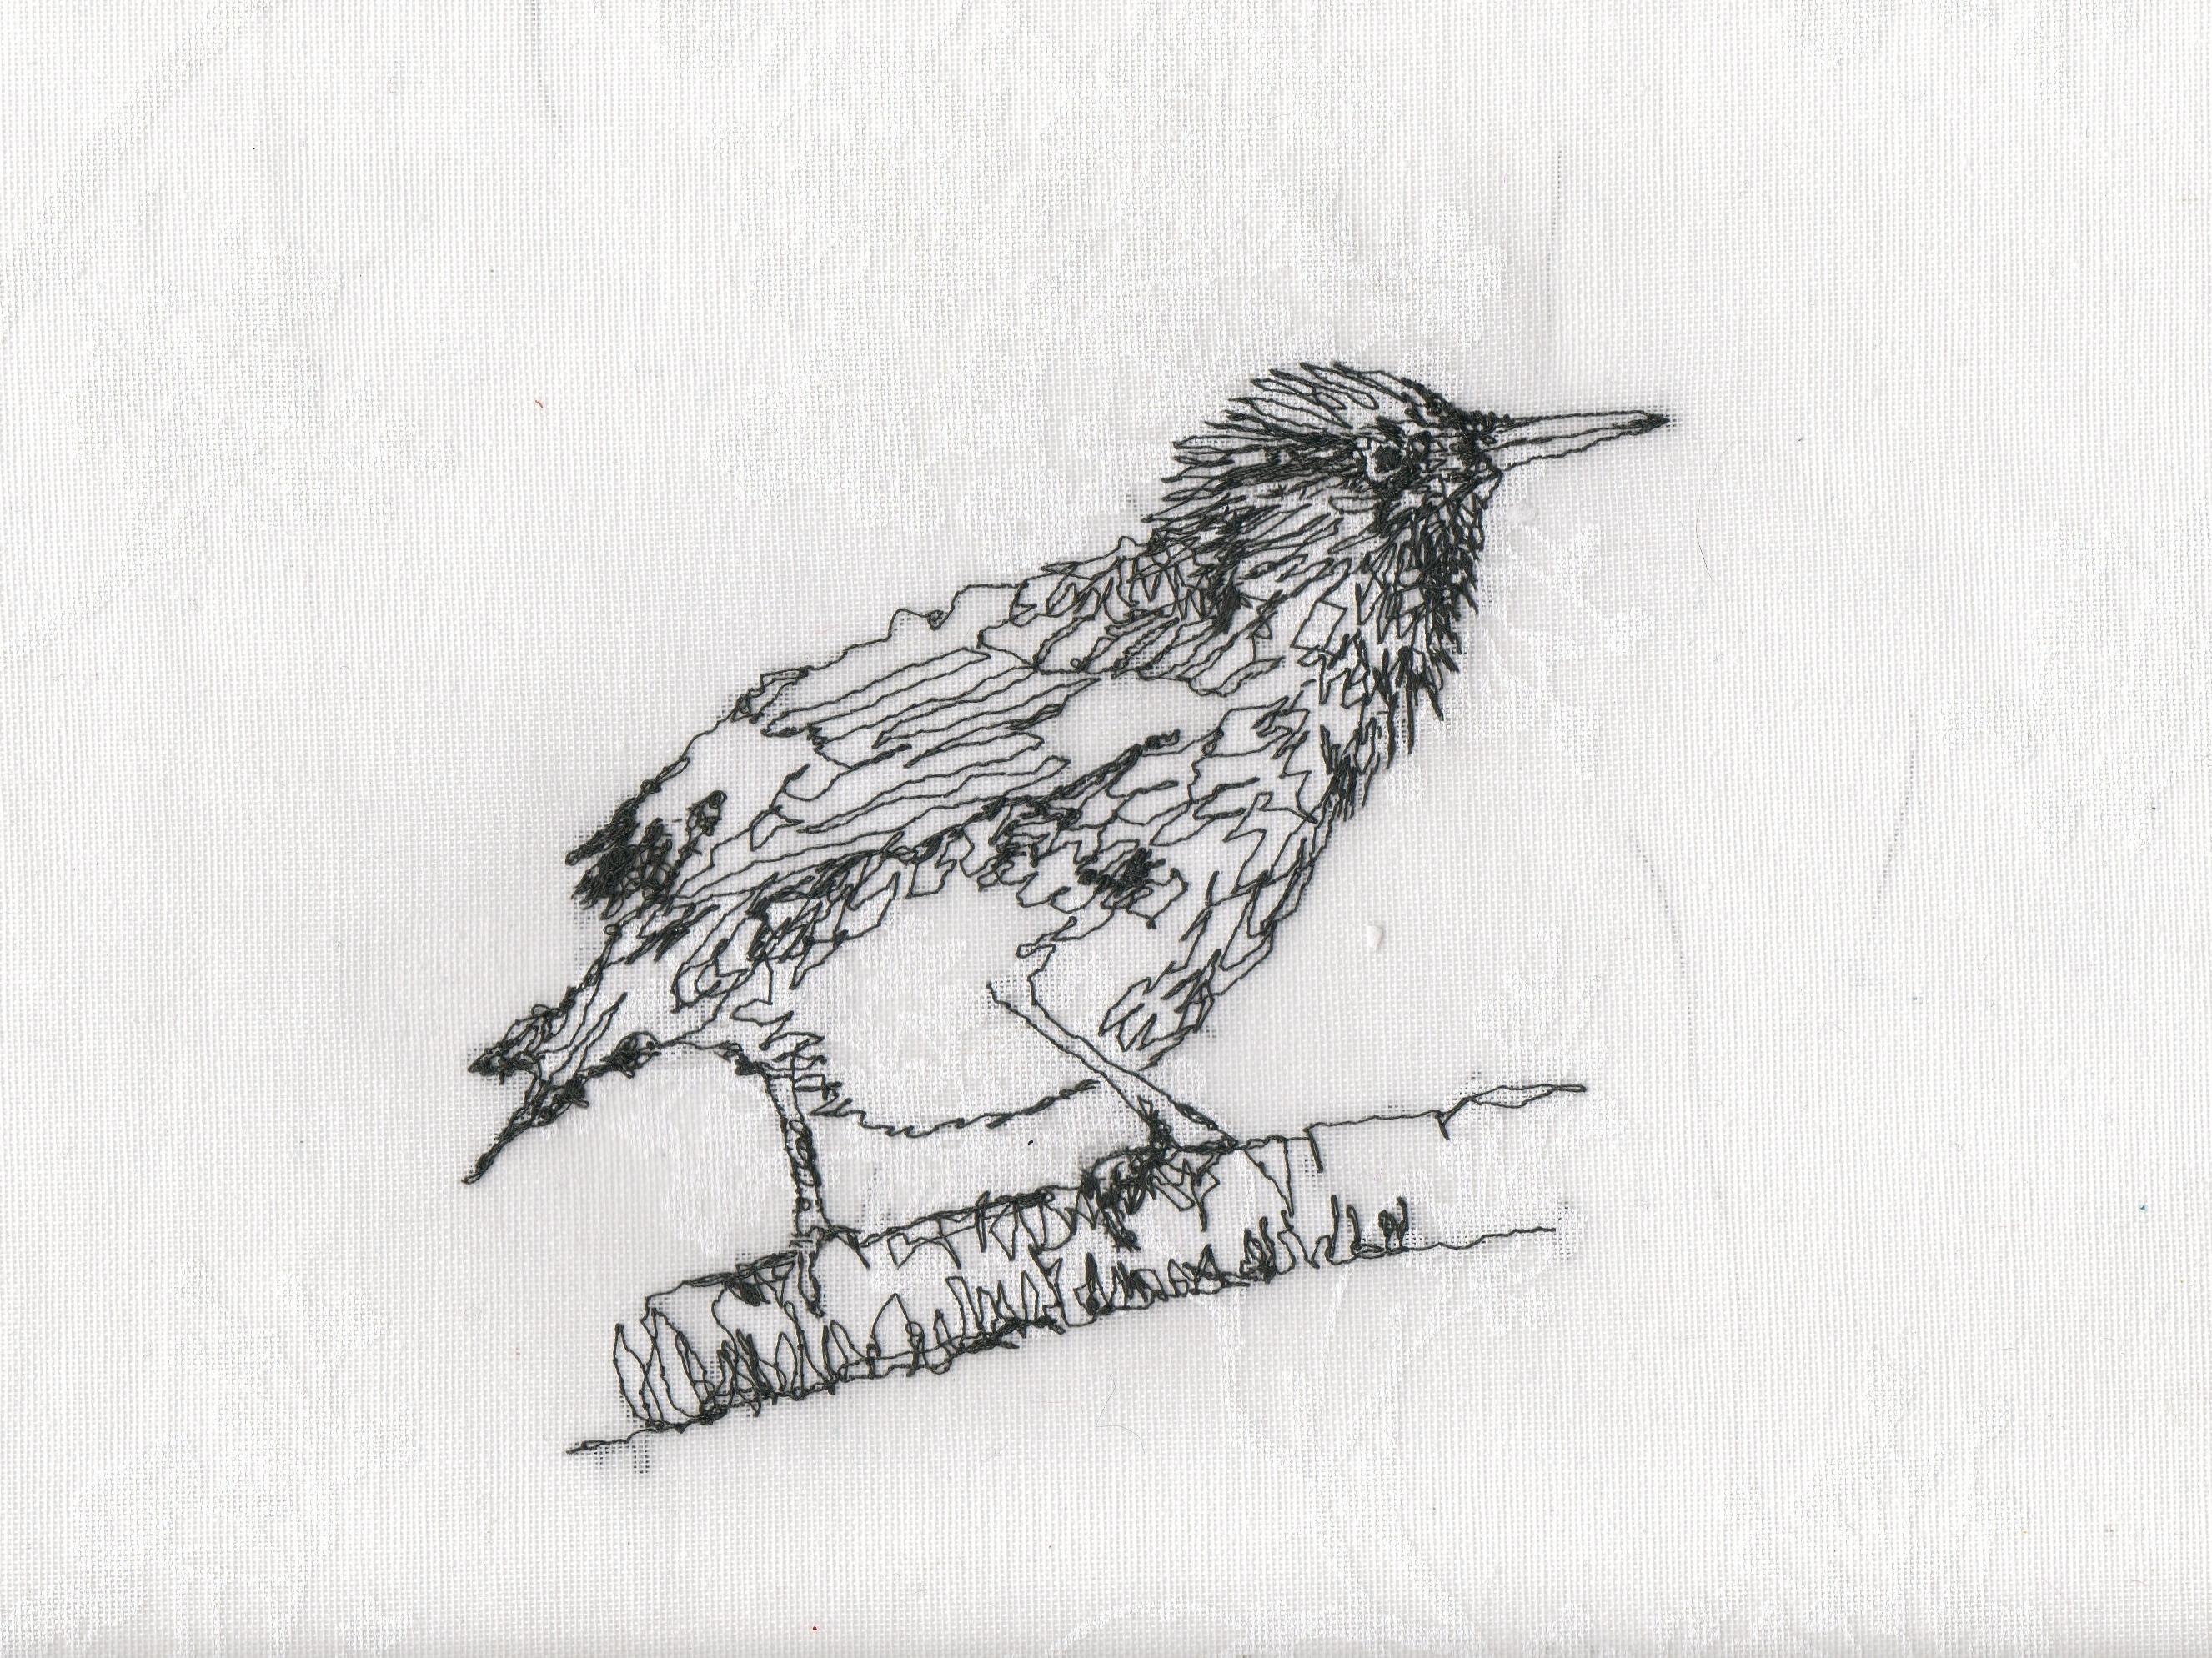 Starling sewing210